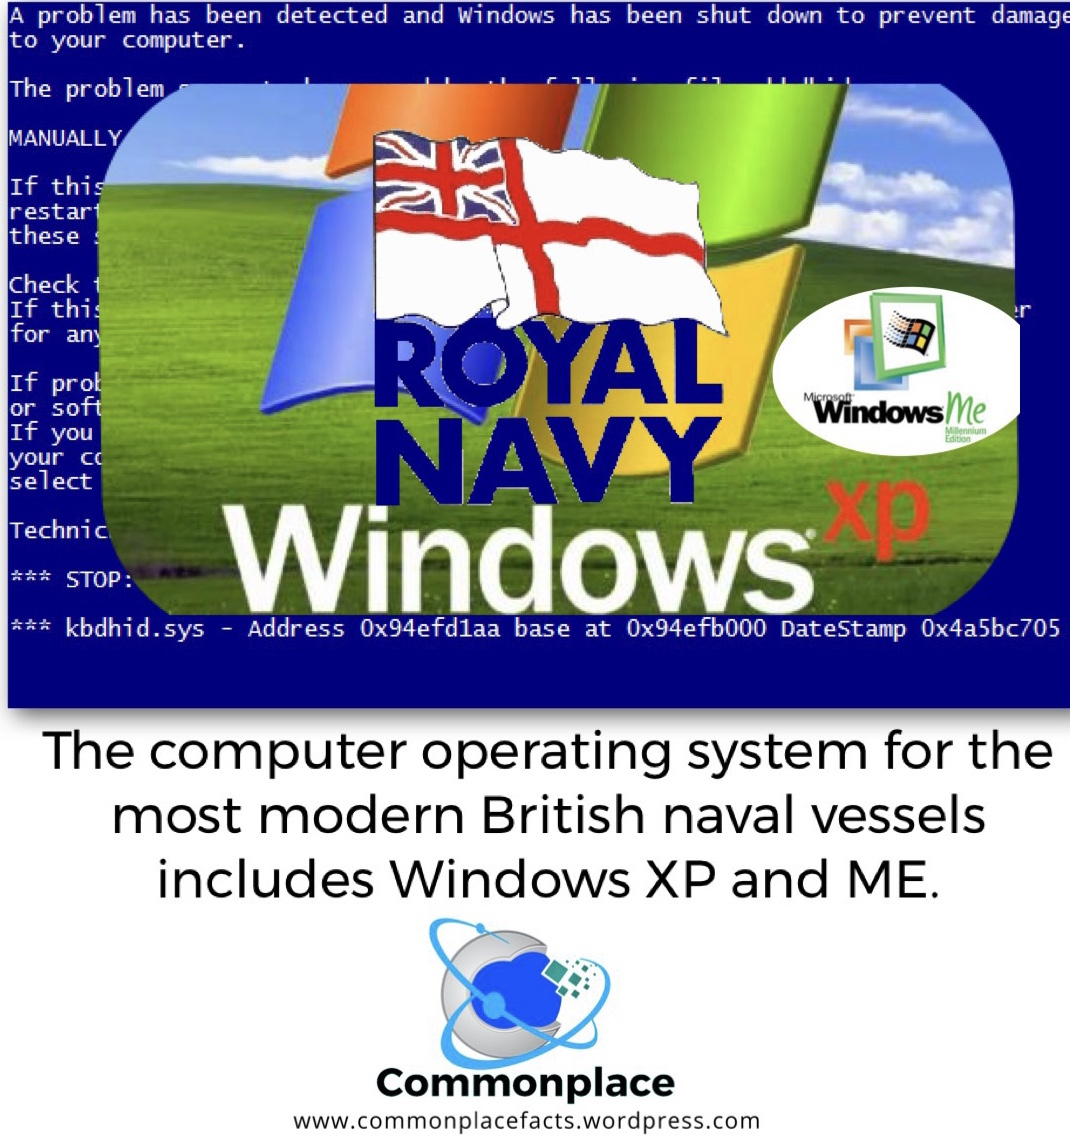 #WindowsXP #WindowsME #Navy #Computers